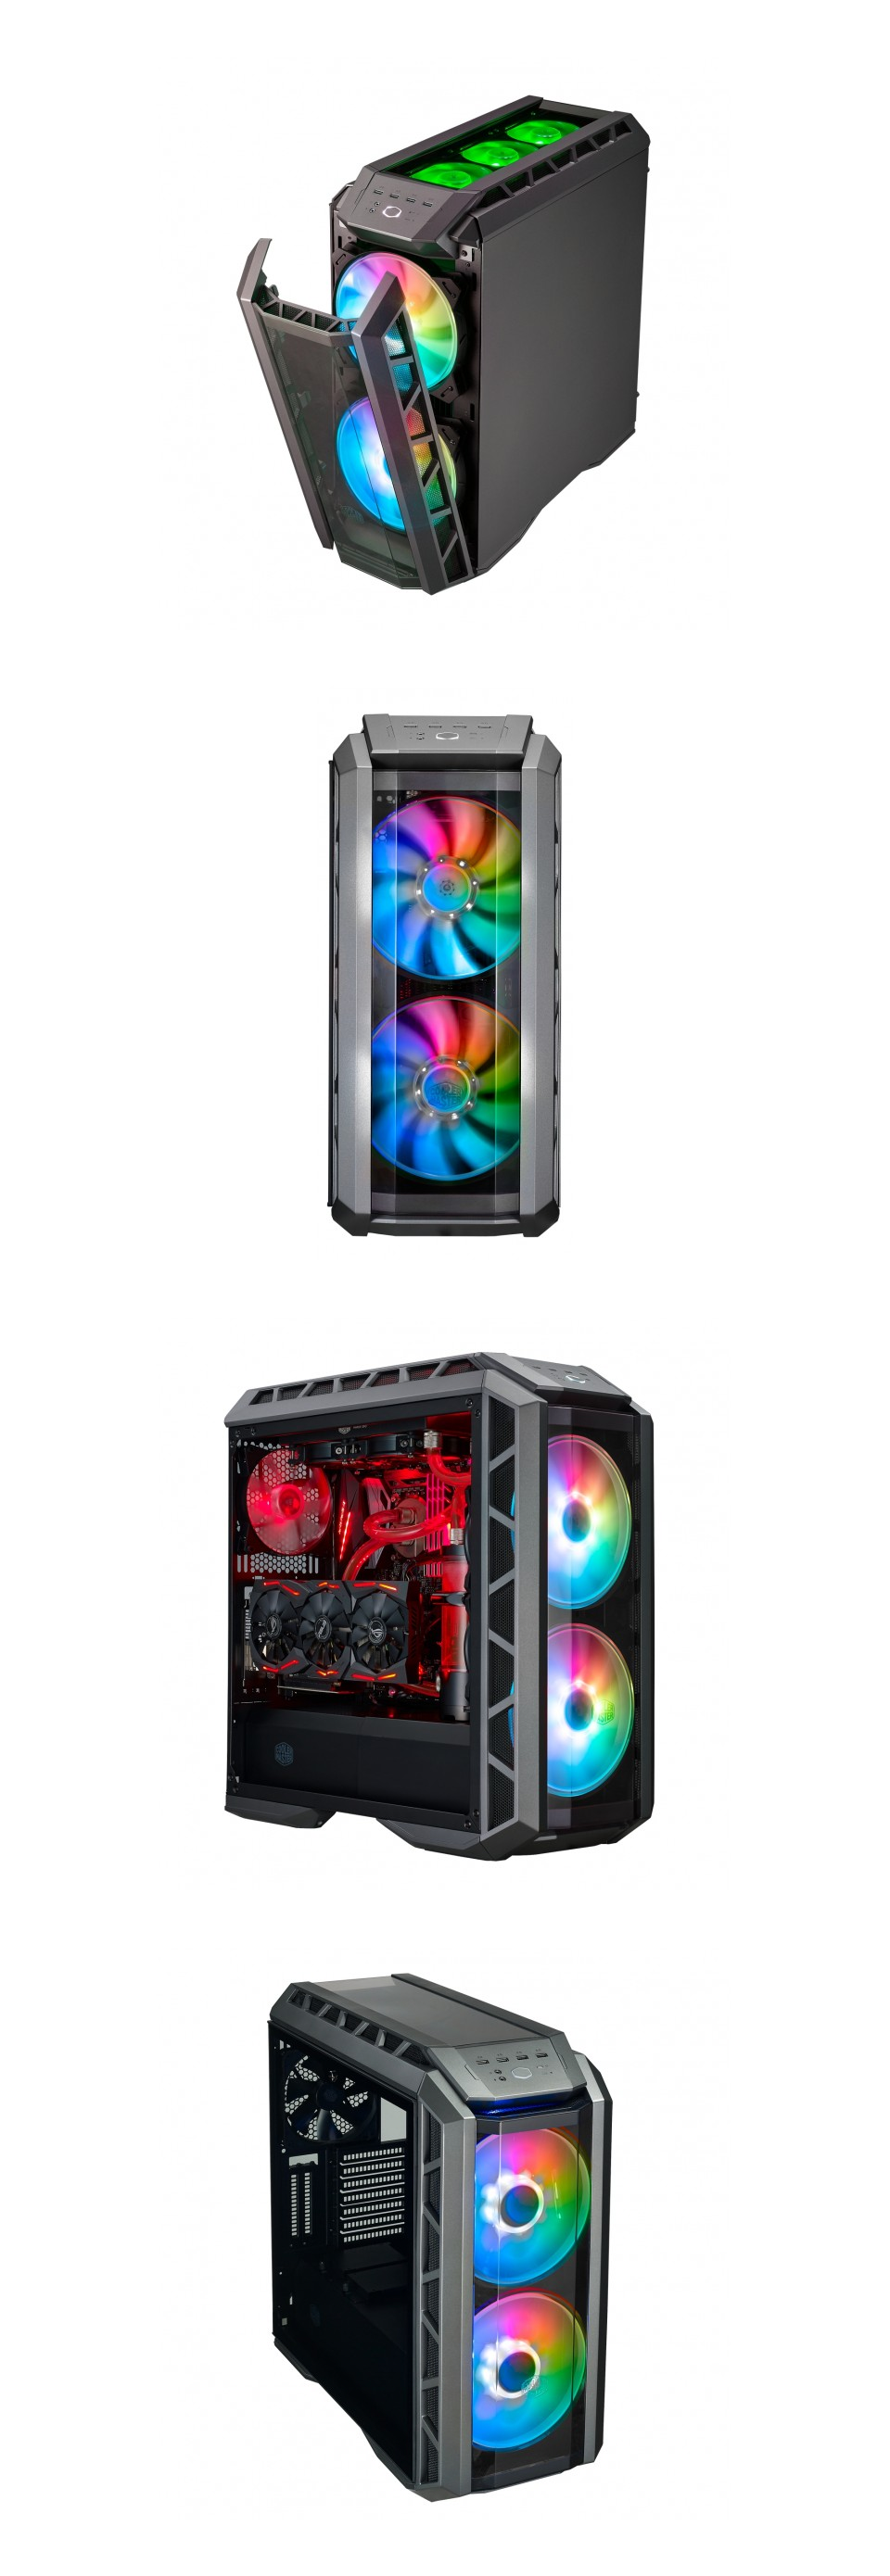 Cooler Master MasterCase H500P ARGB Case product